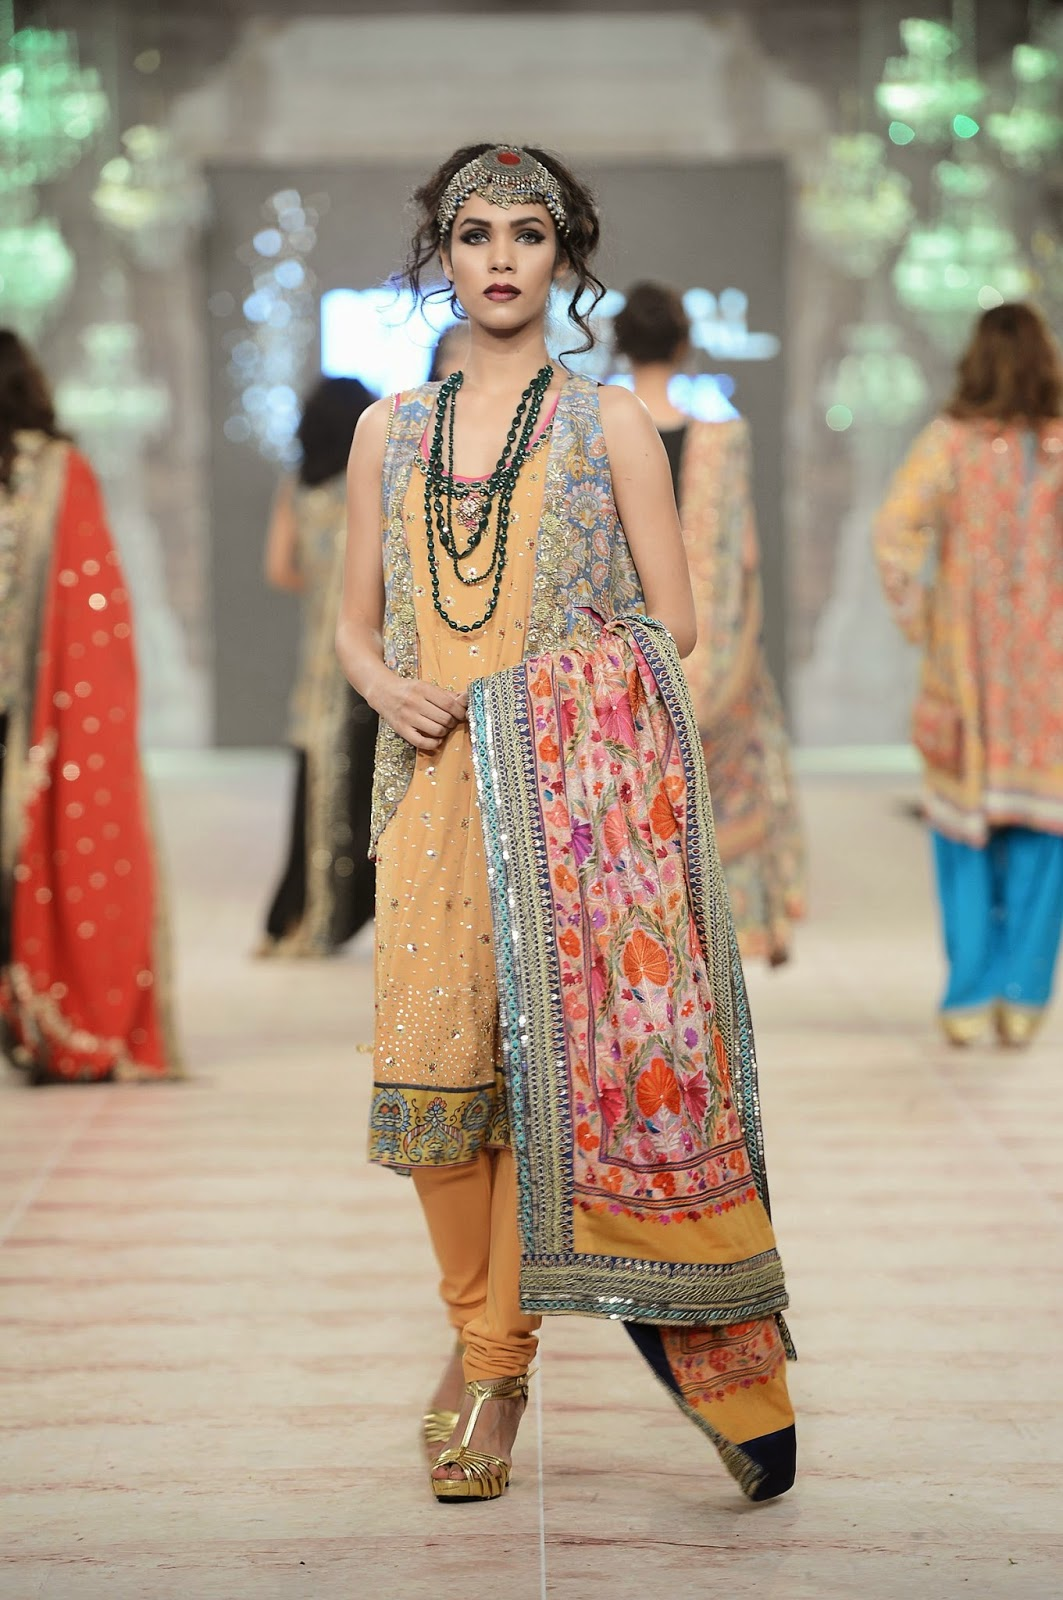 Sonia Nazir shawl